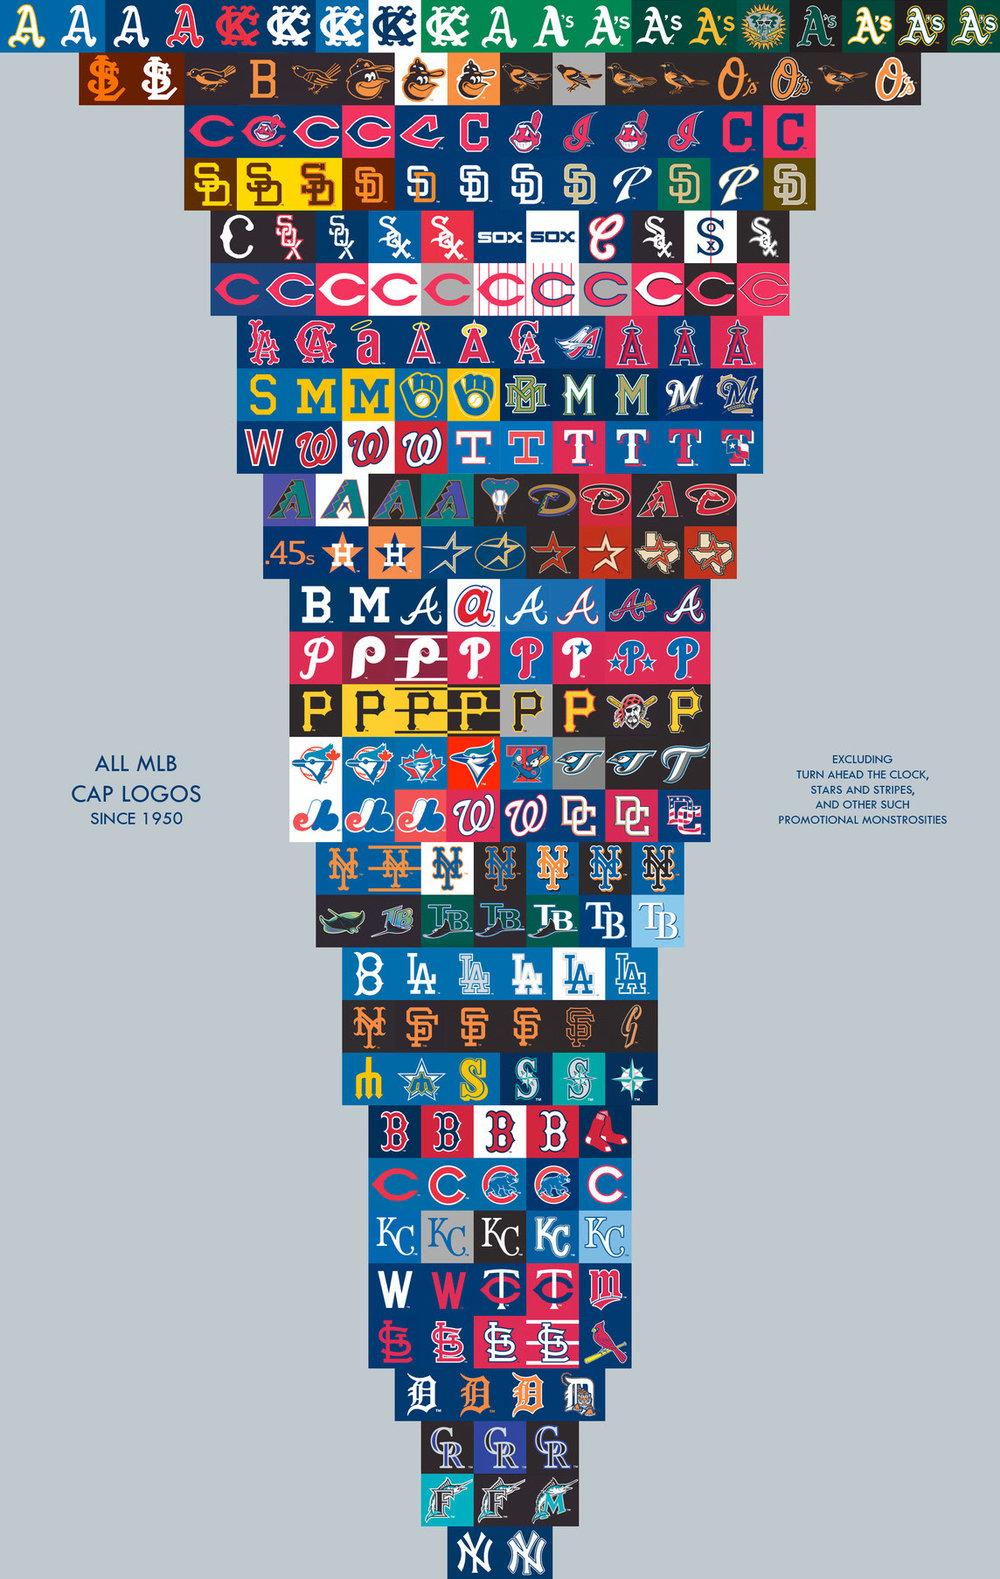 MLB Logo Evolutions